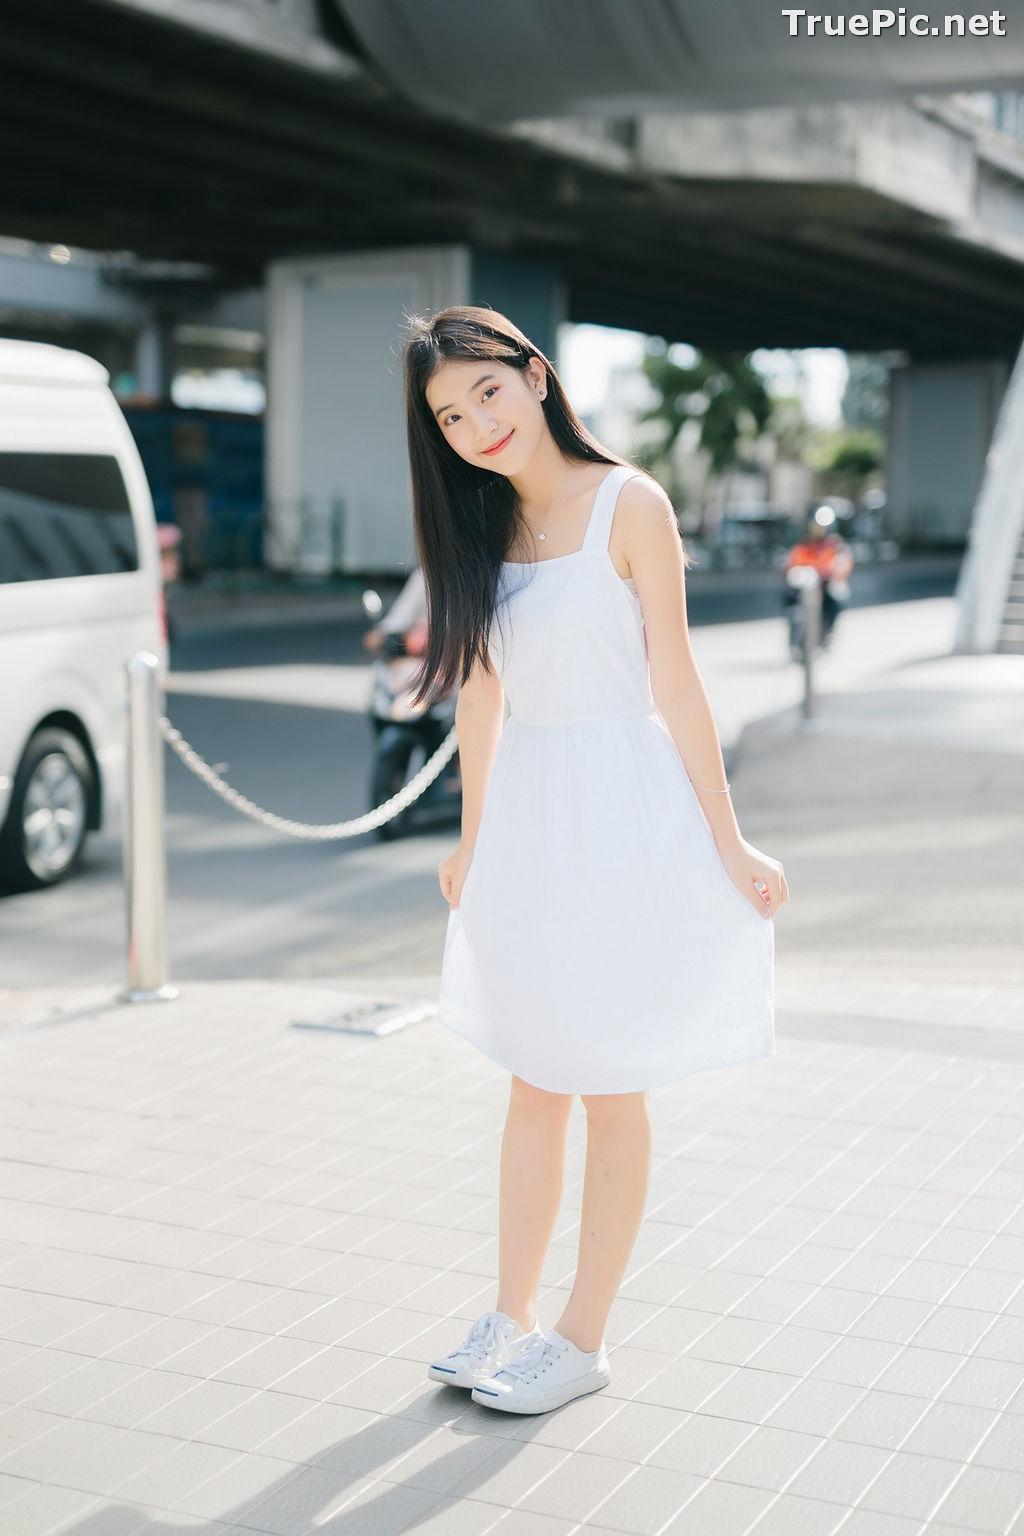 Image Thailand Model - Venita Loywattanakul - A Beautiful White - TruePic.net - Picture-10